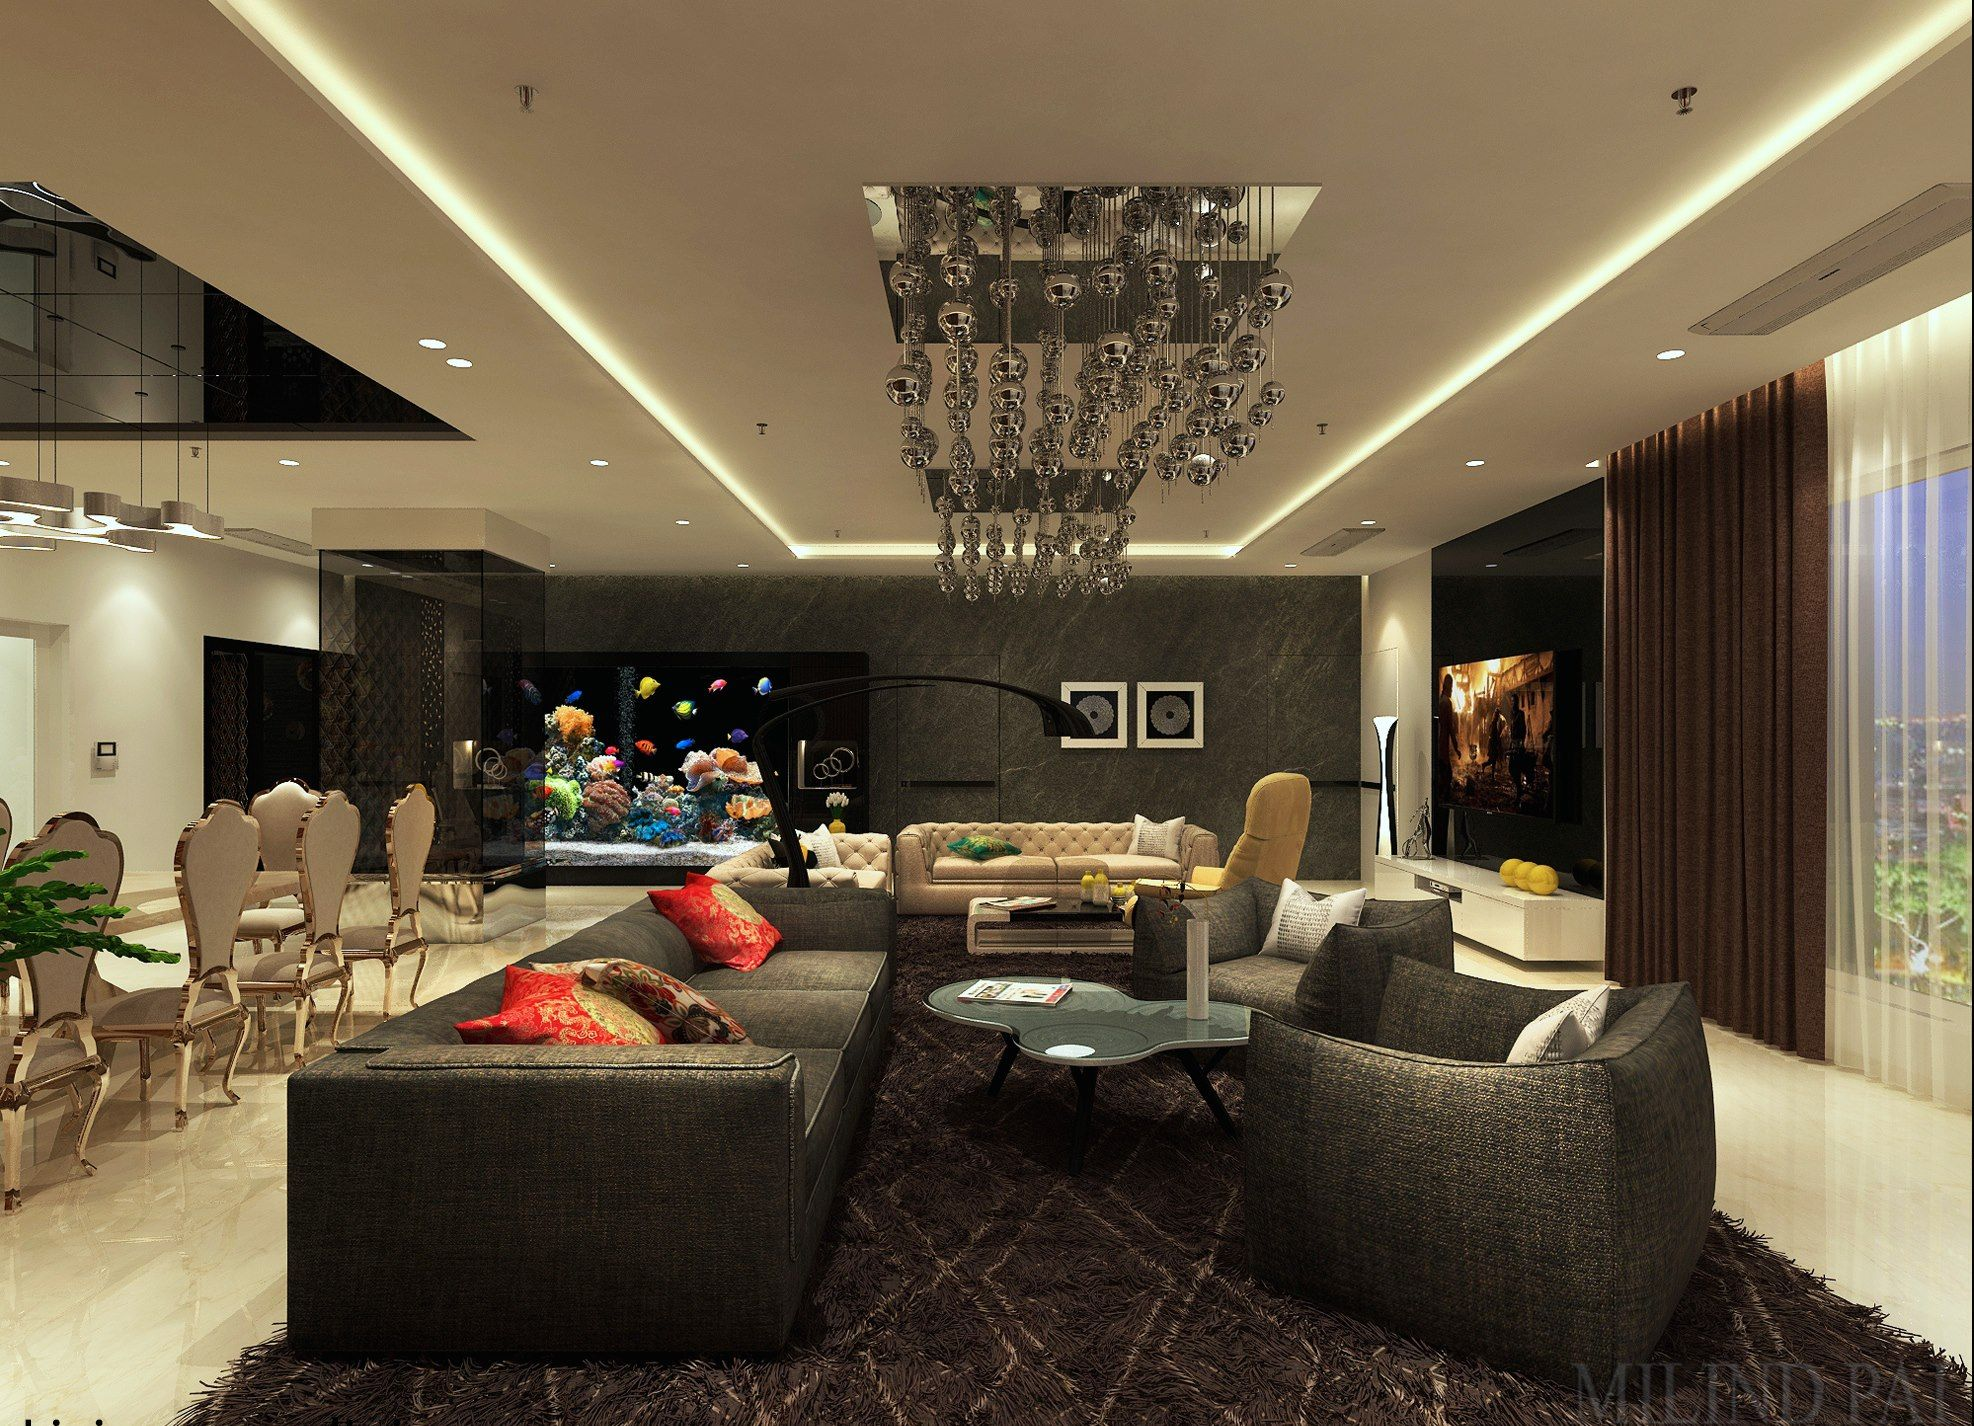 Living Room Designs Mumbai a luxurious living room design for a high rise apartment in mumbai